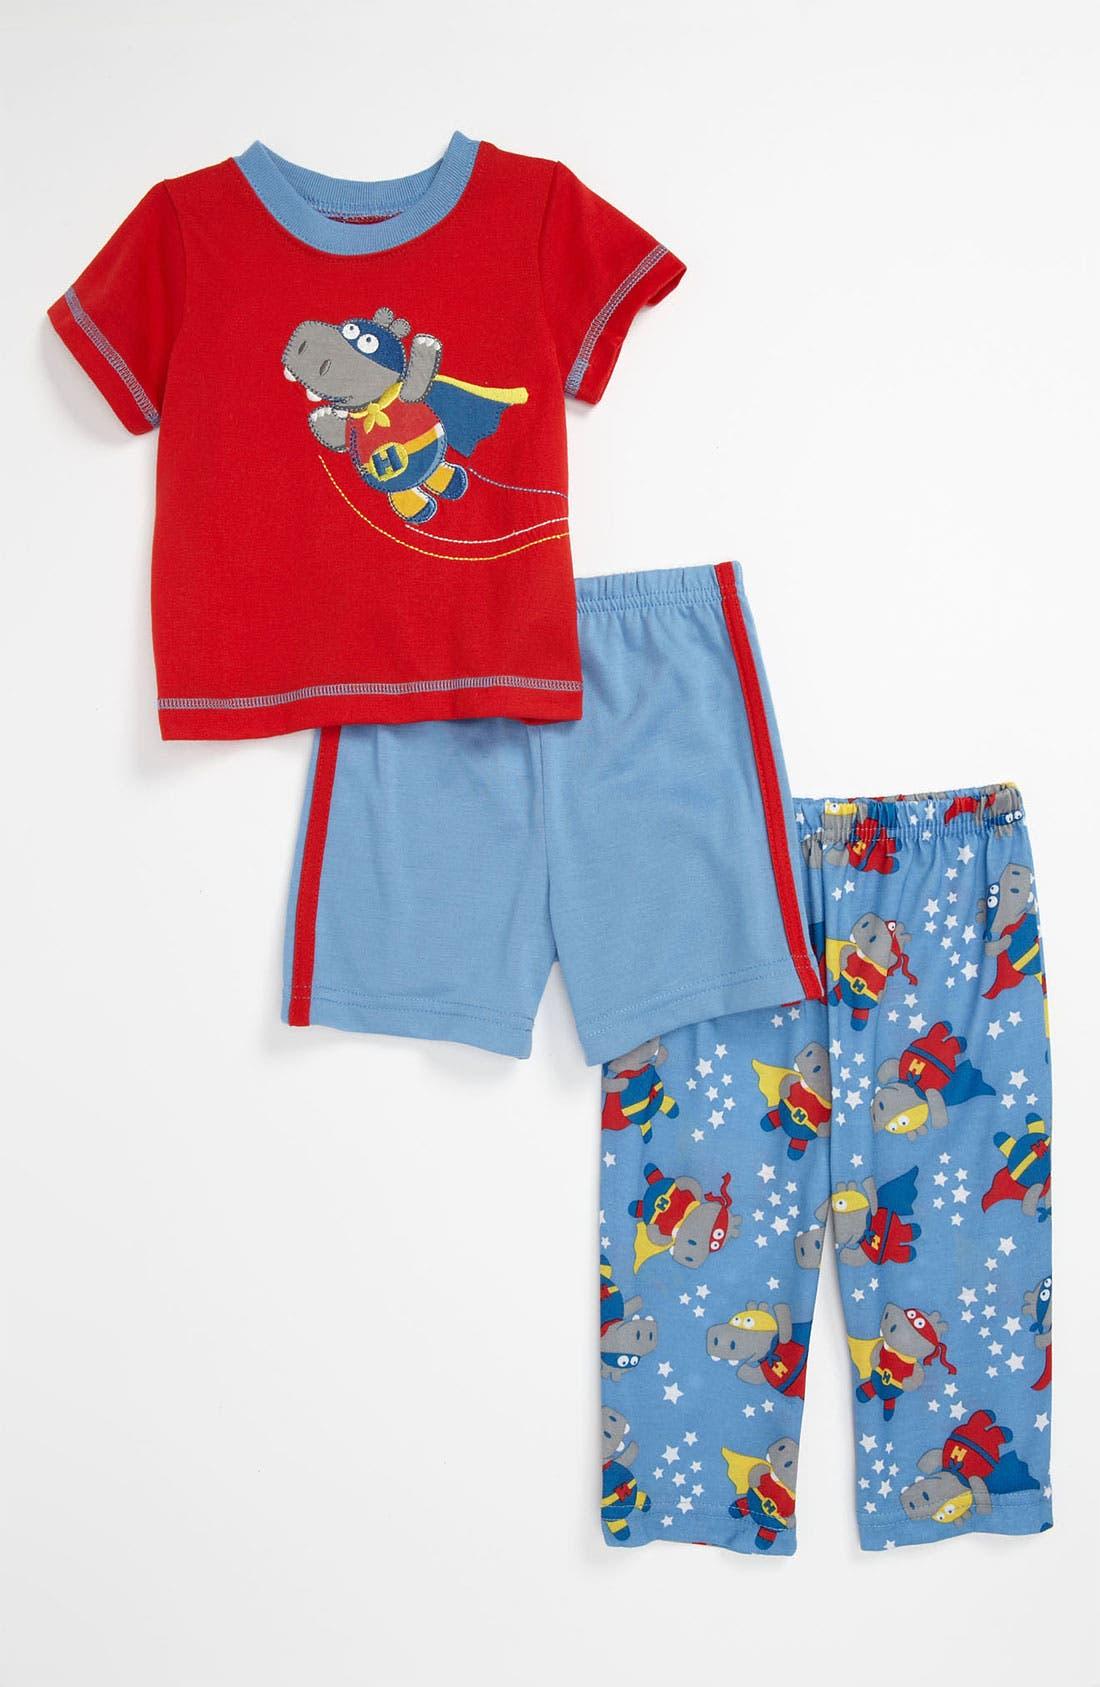 Alternate Image 1 Selected - Little Me 'Hippo' Sleepwear Set (Infant)